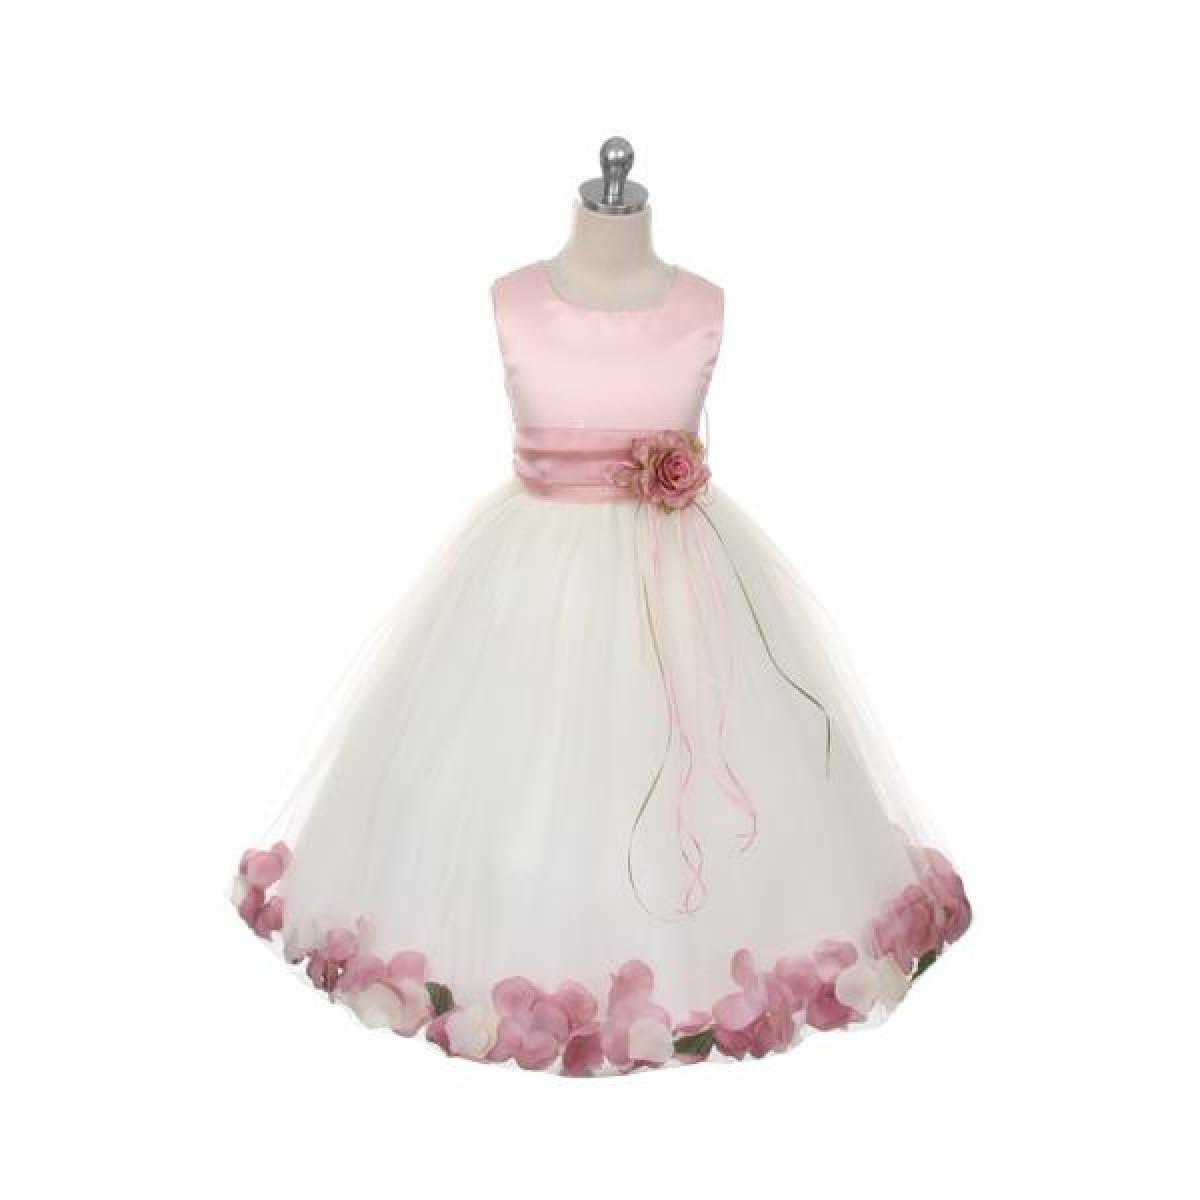 Sleeveless Satin Flower Petal Dress